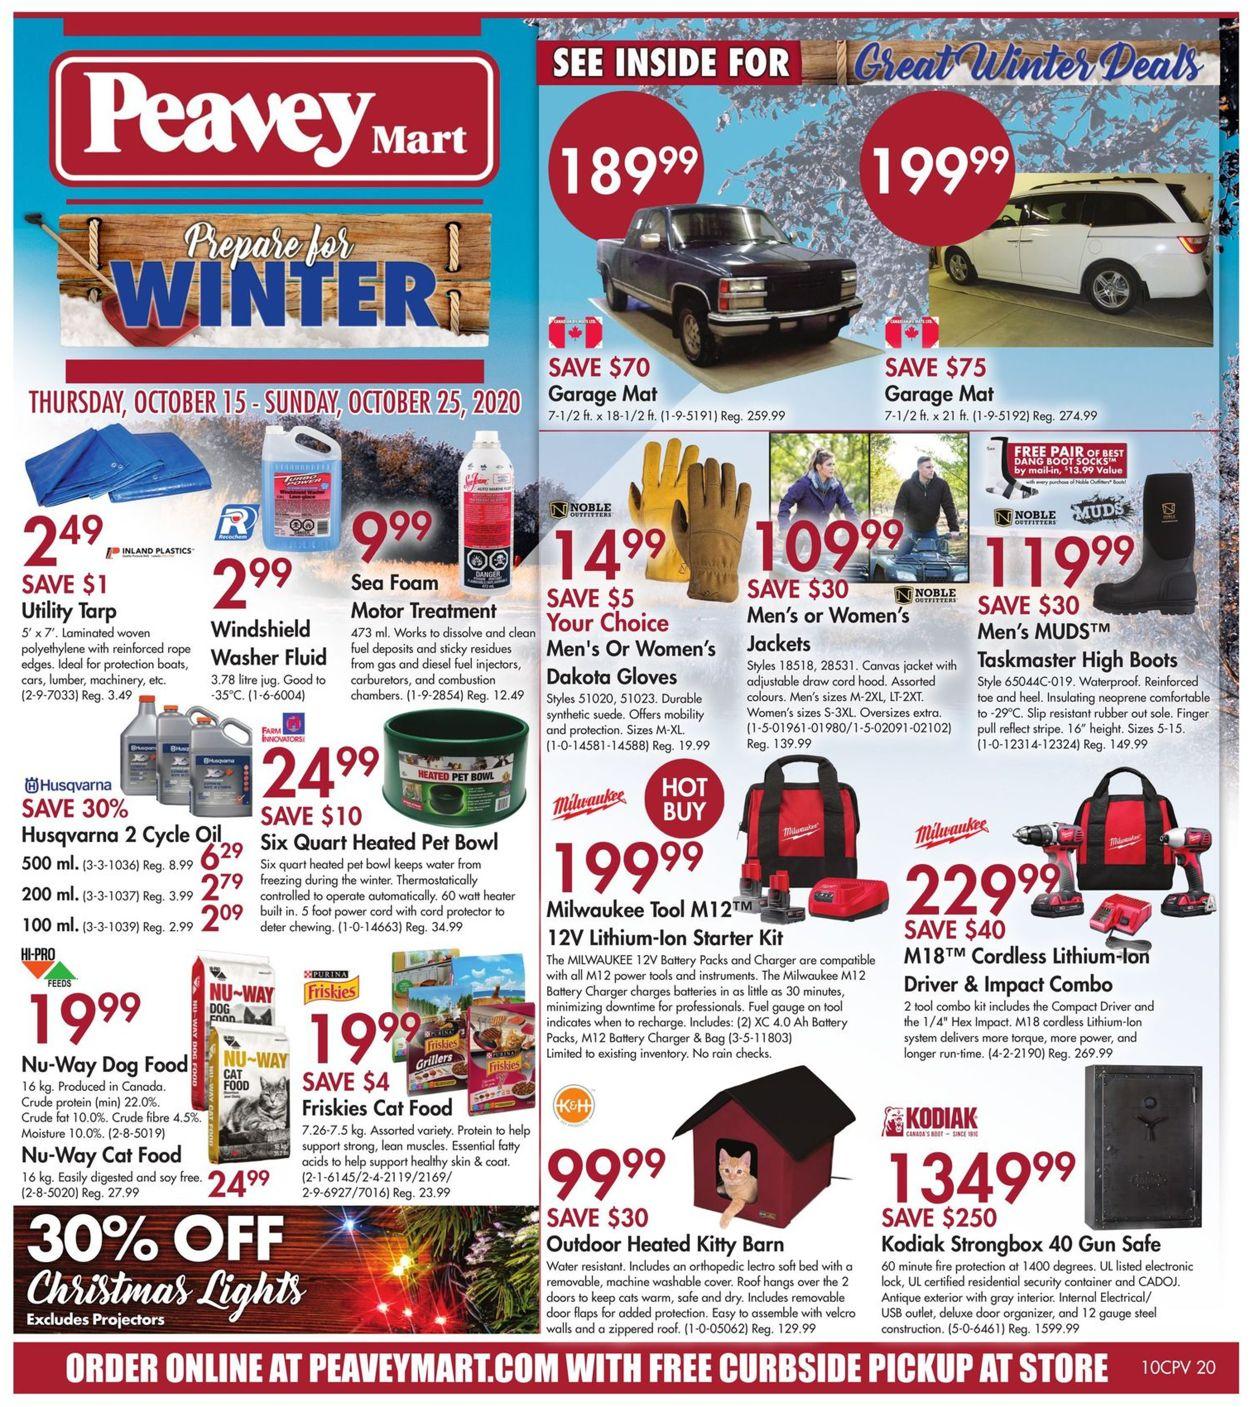 Peavey Mart Flyer - 10/15-10/25/2020